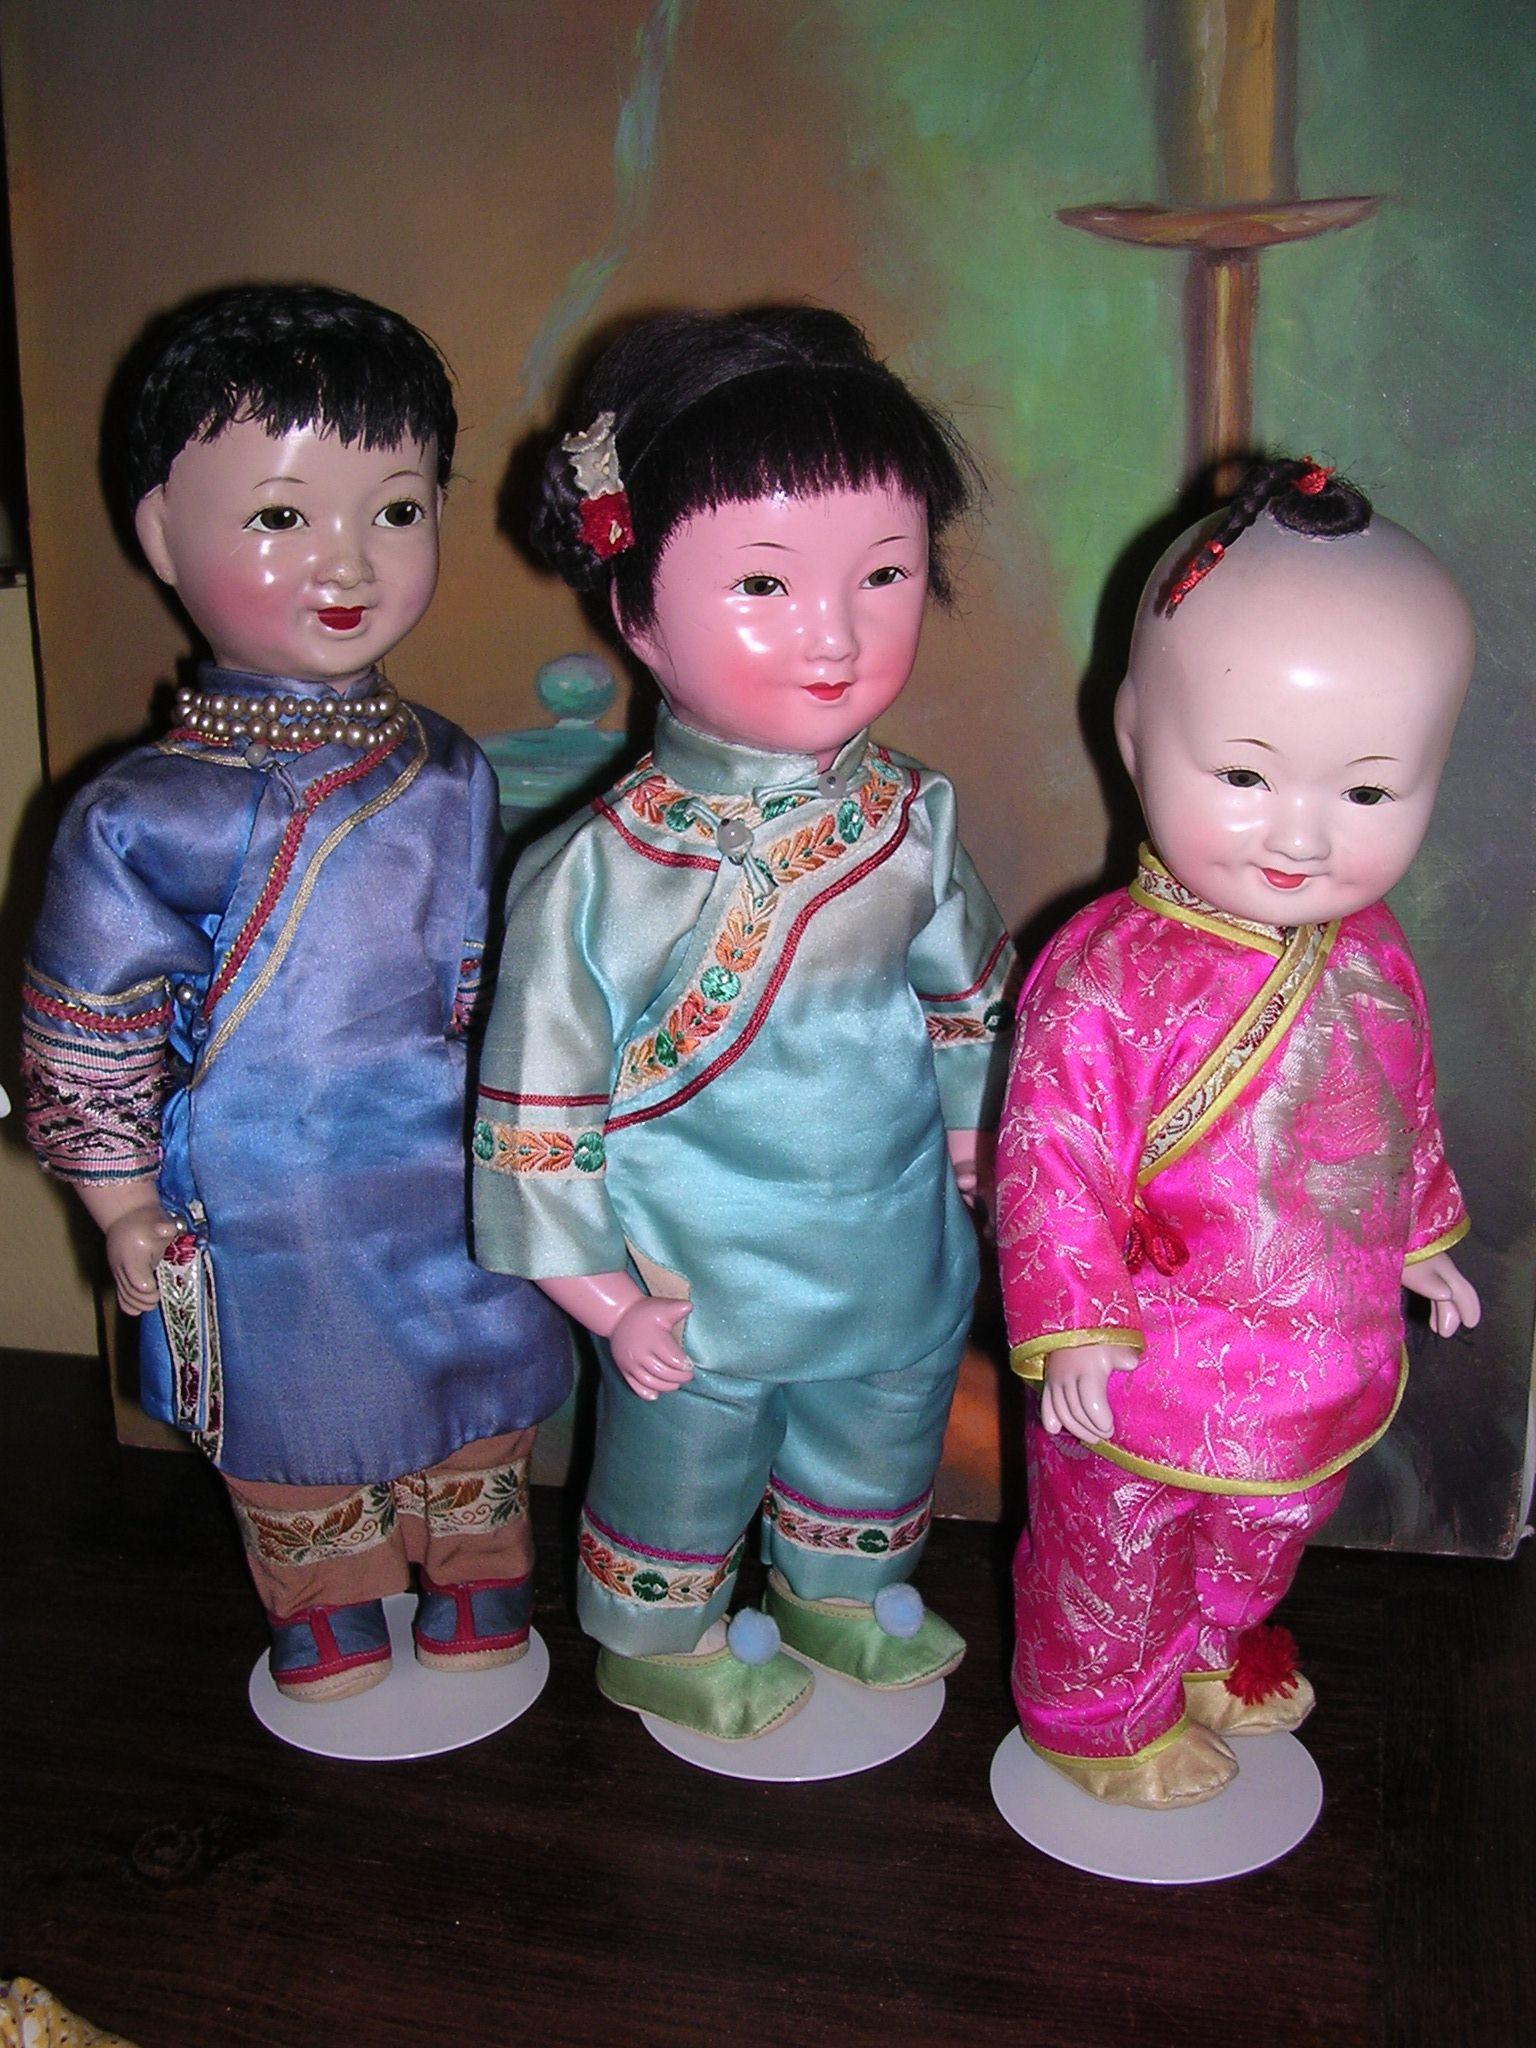 Vintage Chinese dolls circa 19501960's Chinese dolls